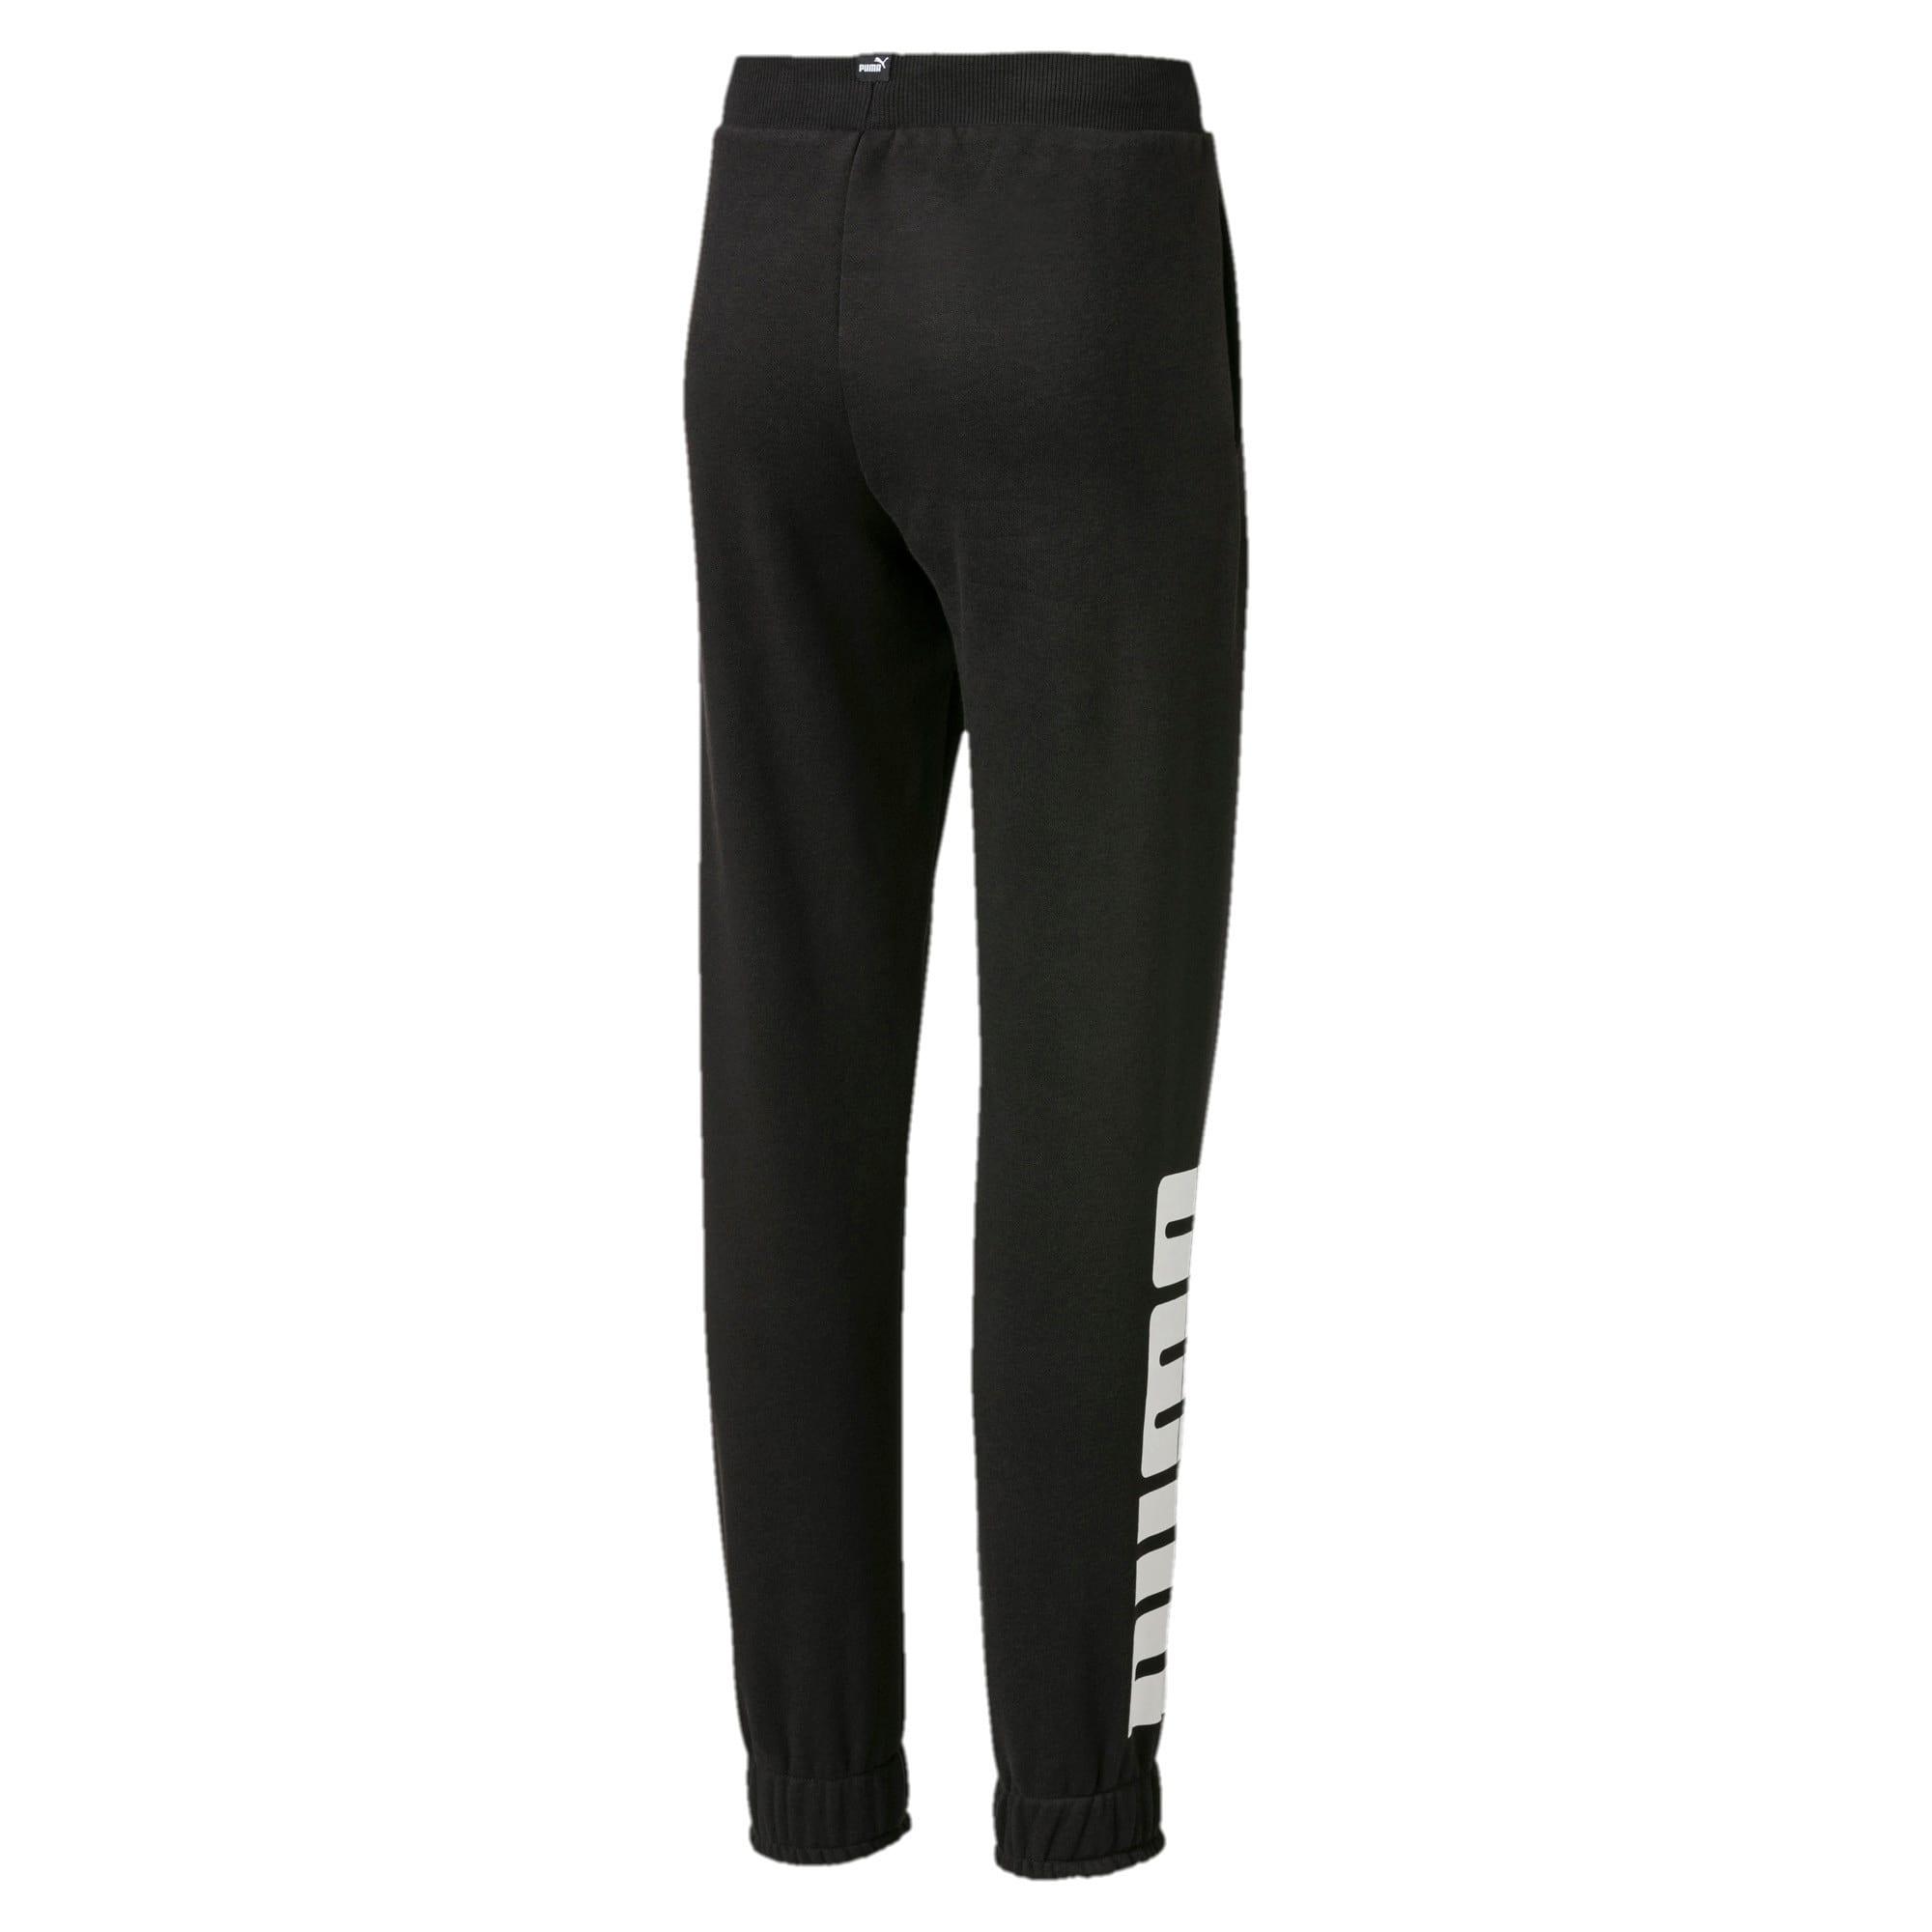 Thumbnail 2 of Knitted Boys' Rebel Sweatpants, Puma Black, medium-IND